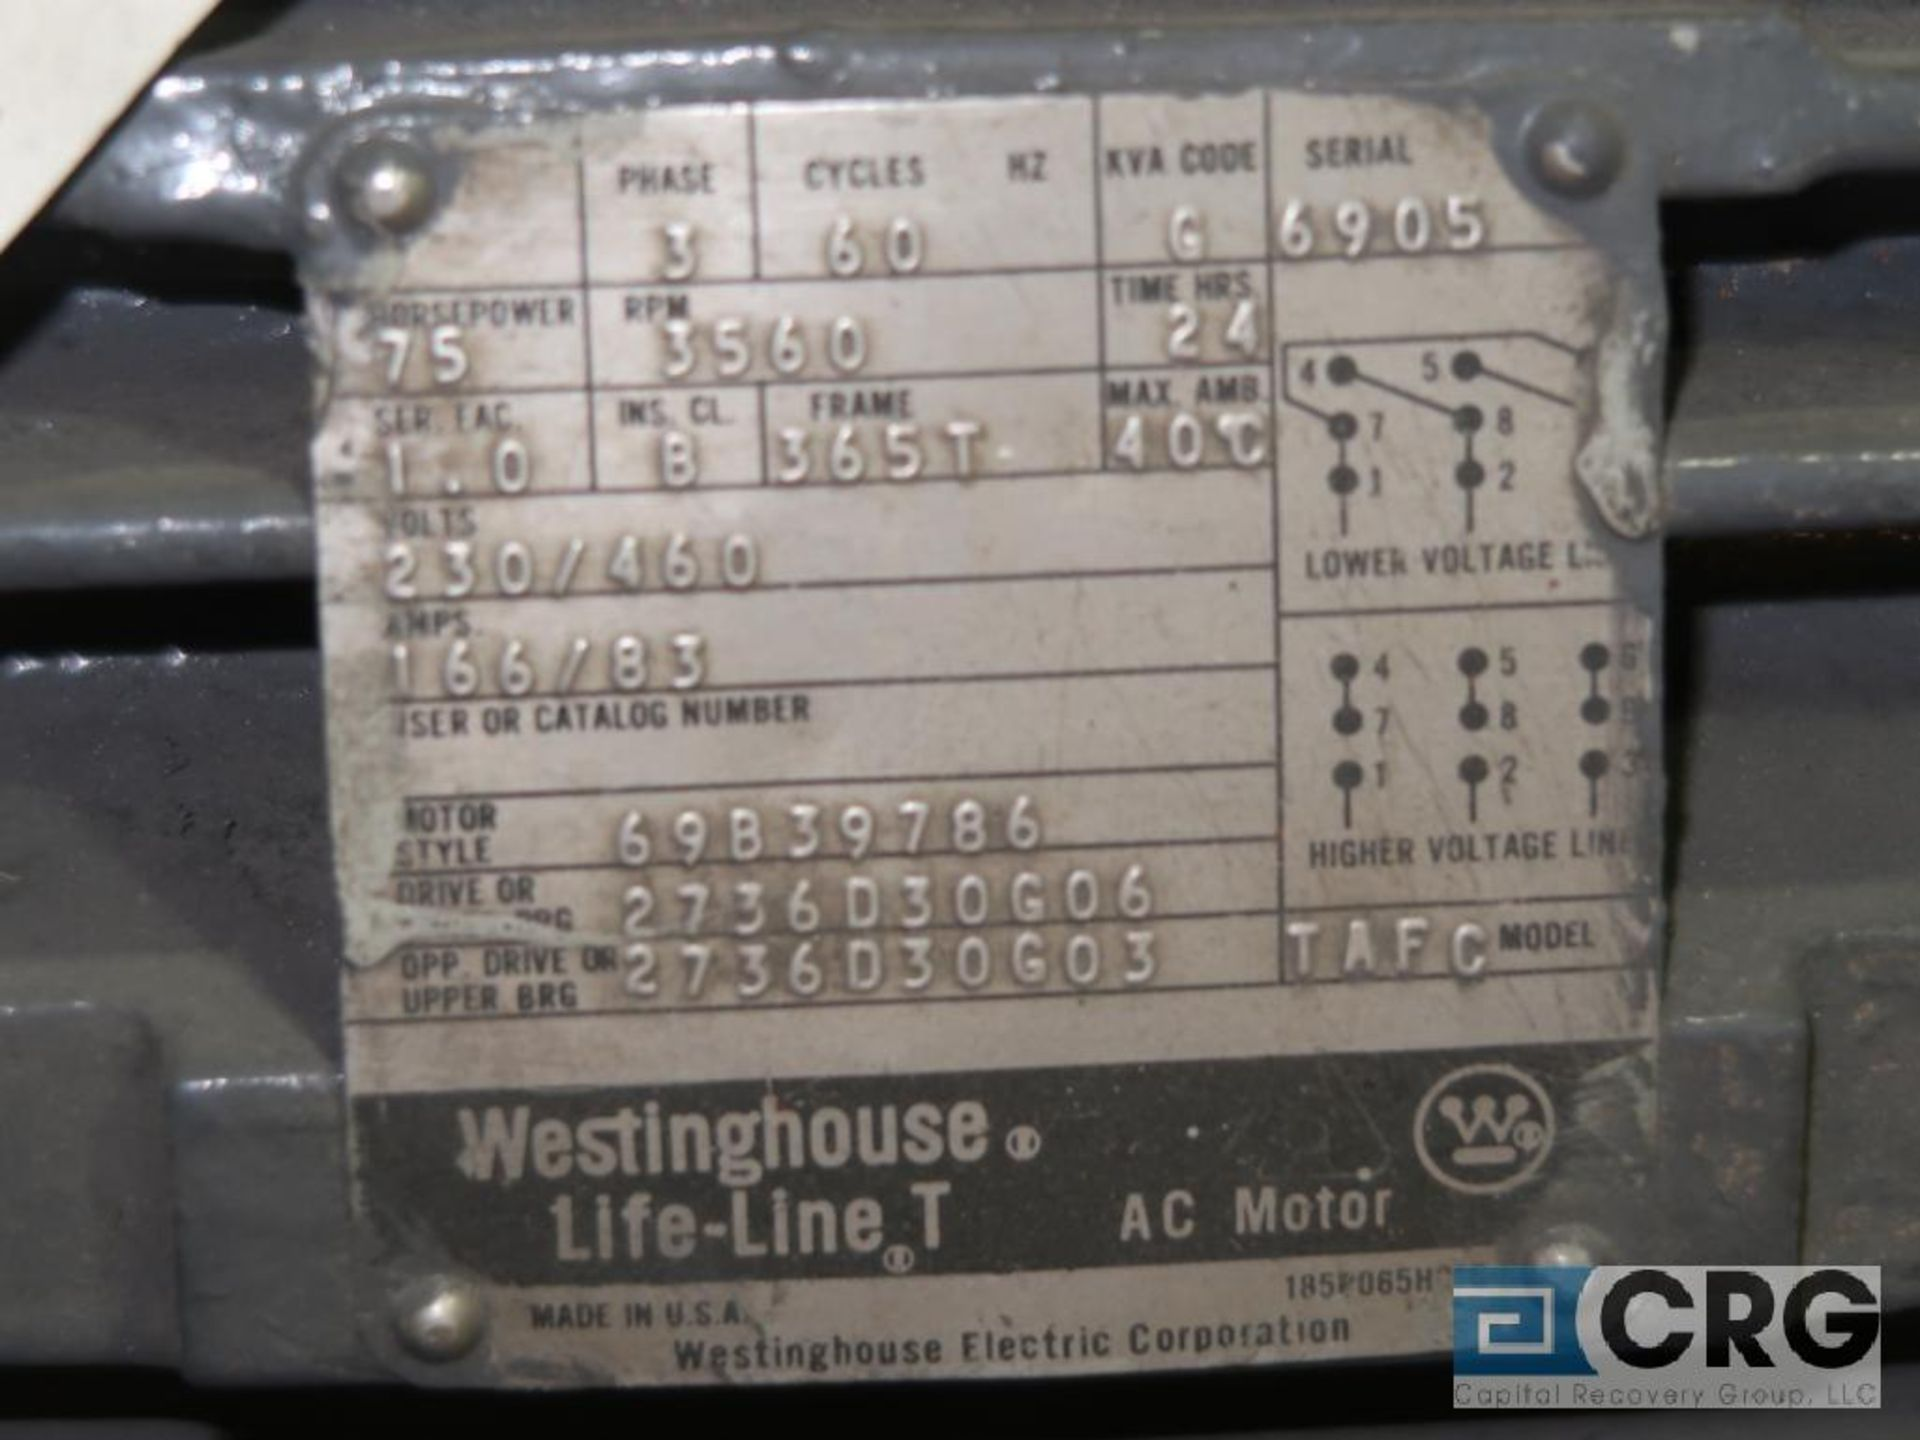 Westinghouse Life-Line T AC motor, 75 HP, 3,560 RPMs, 230/460 volt, 3 ph., 365T frame (Finish - Image 2 of 2